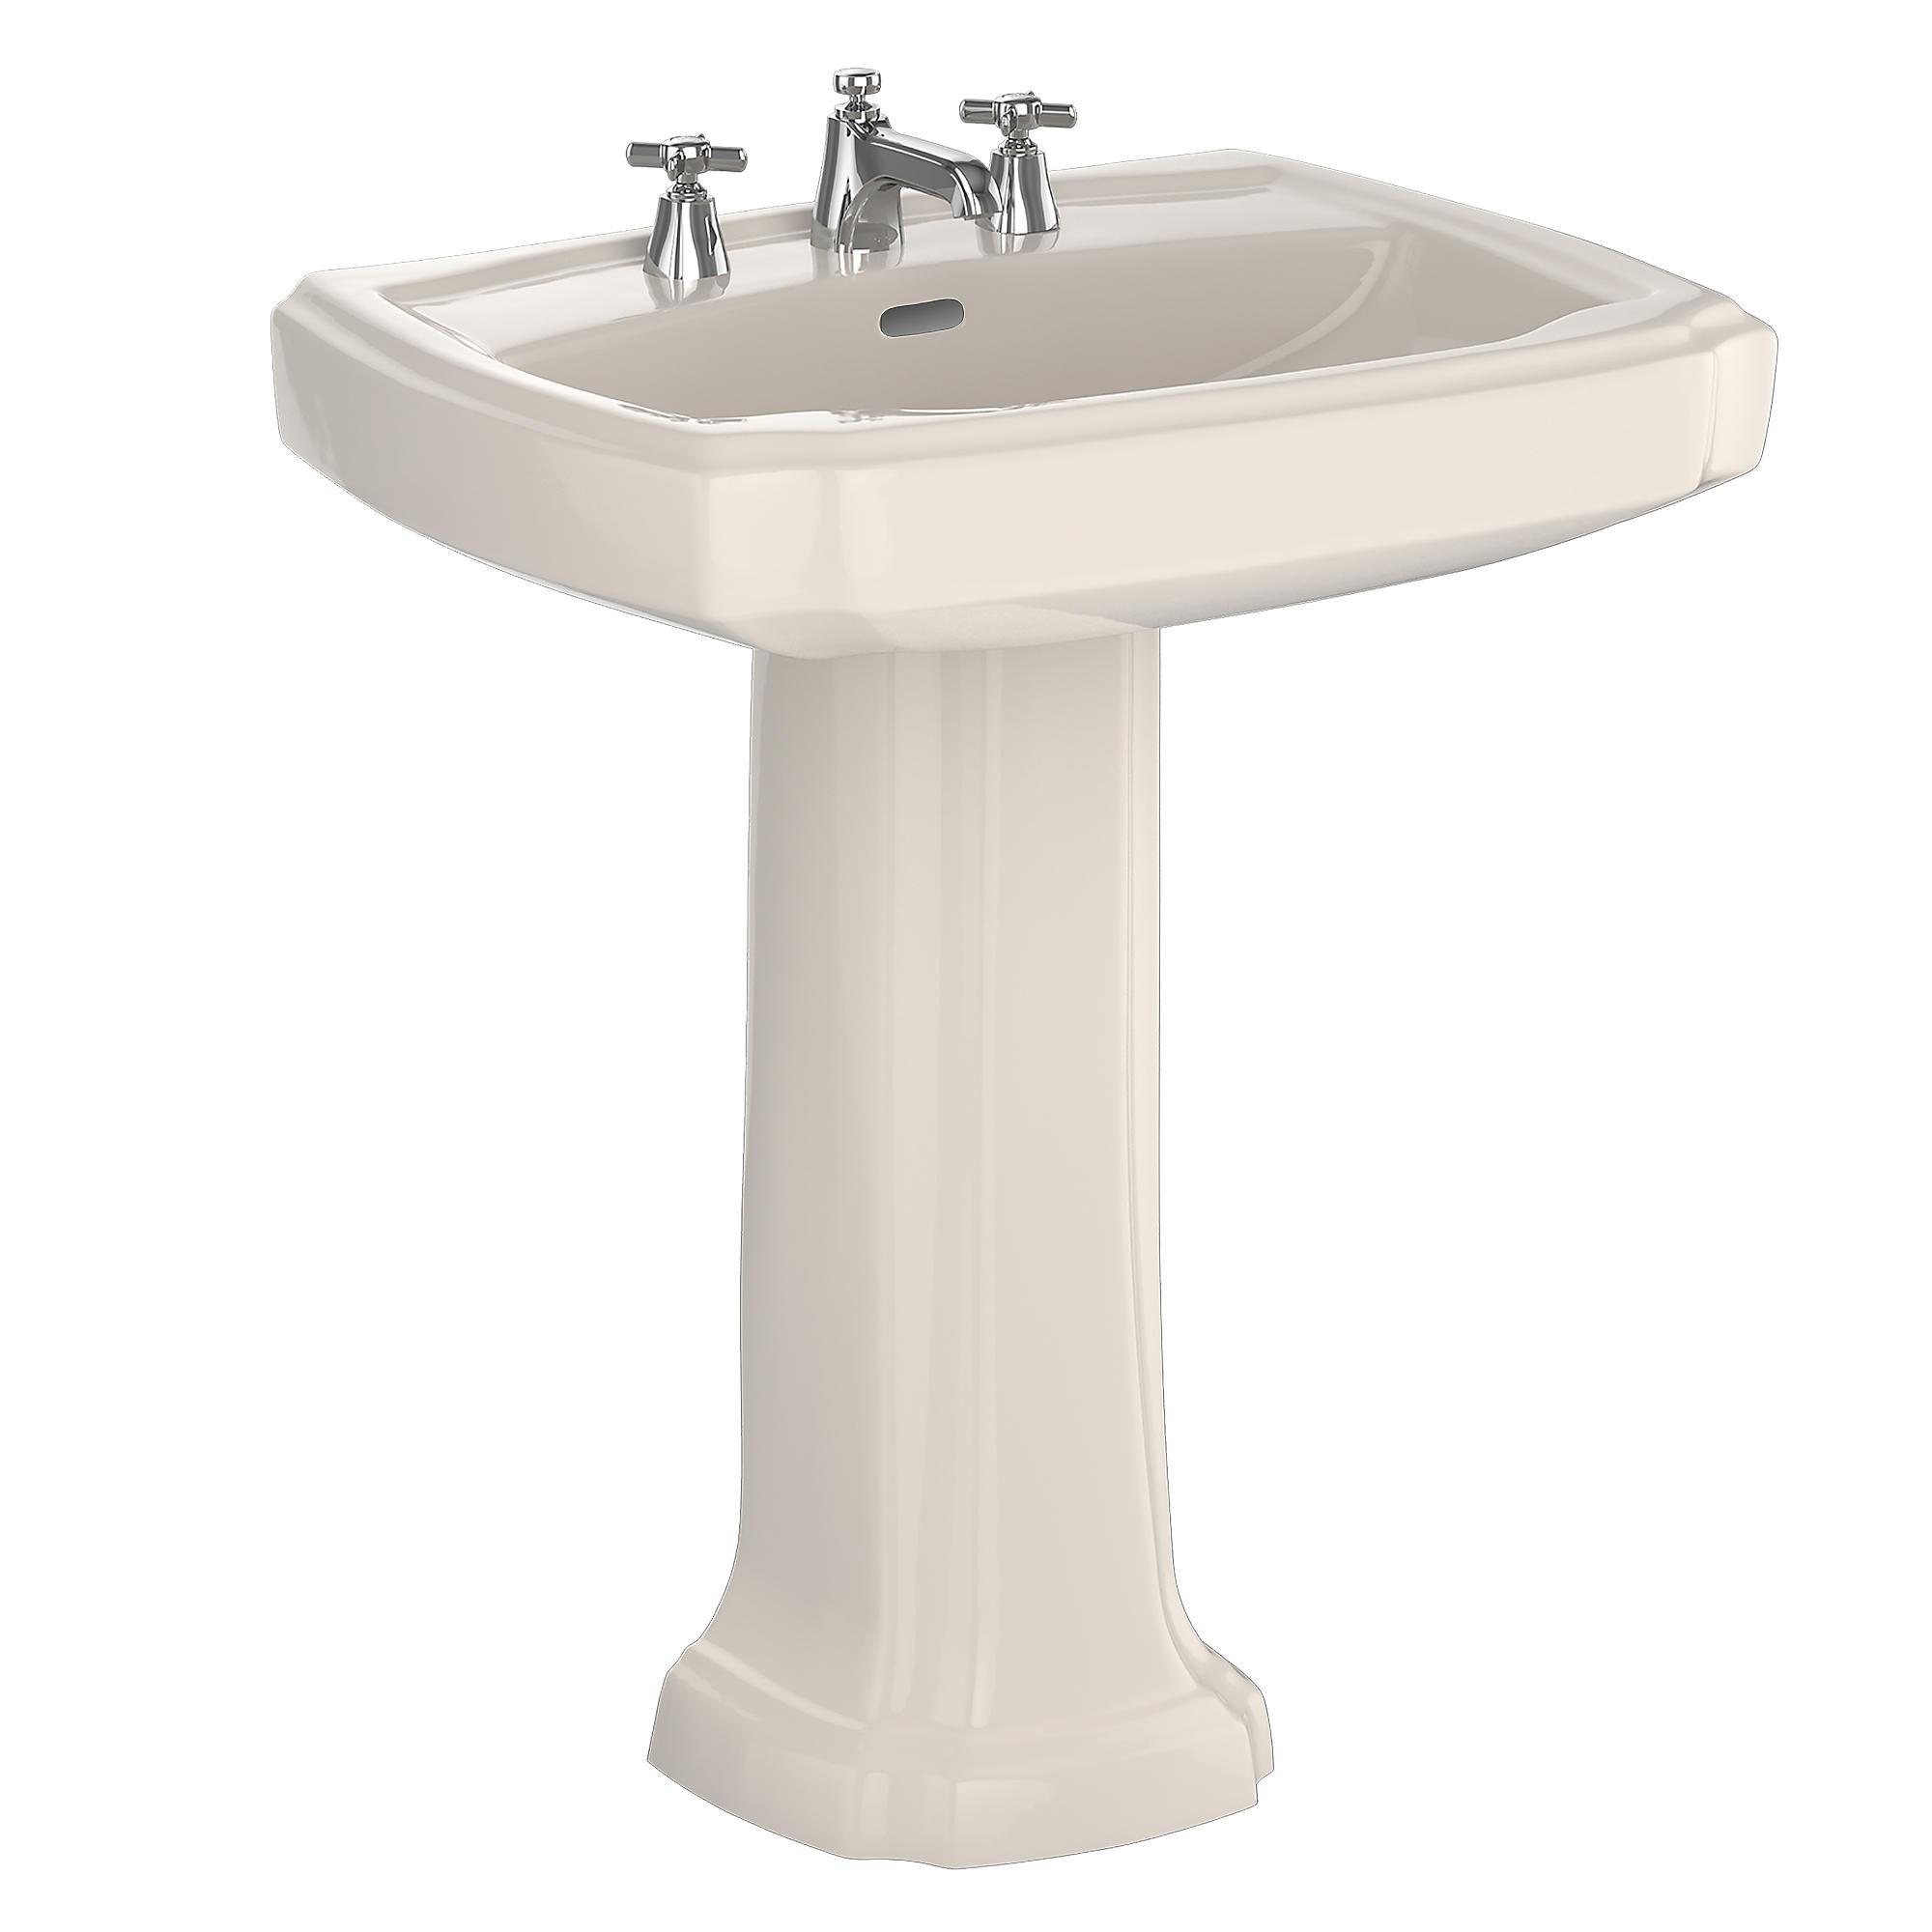 Lpt970 12 guinevere  27  pedestal lavatory 0